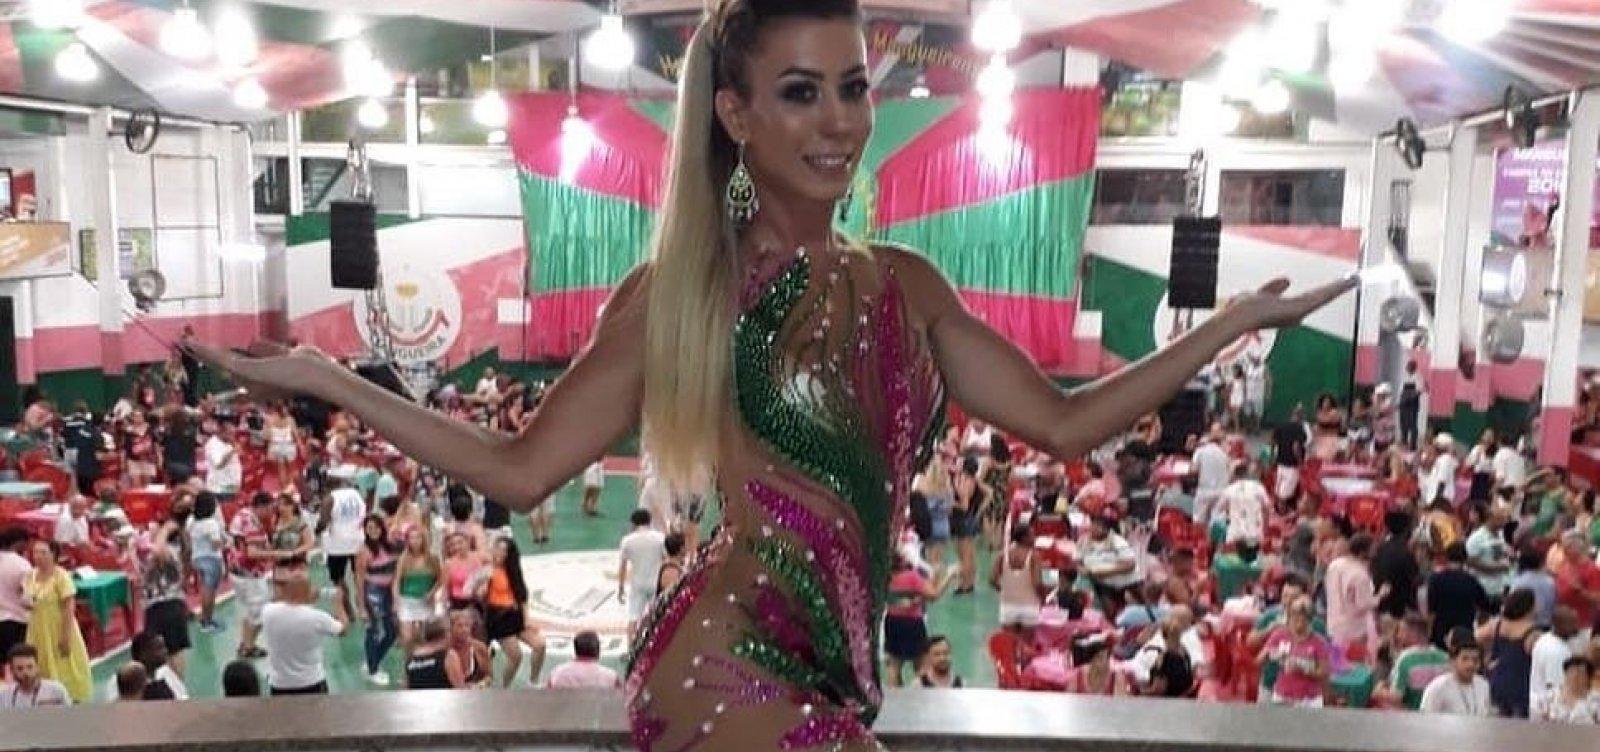 02e362c2e2 Mangueira apresenta primeira musa transexual da escola. Patrícia Souza ...